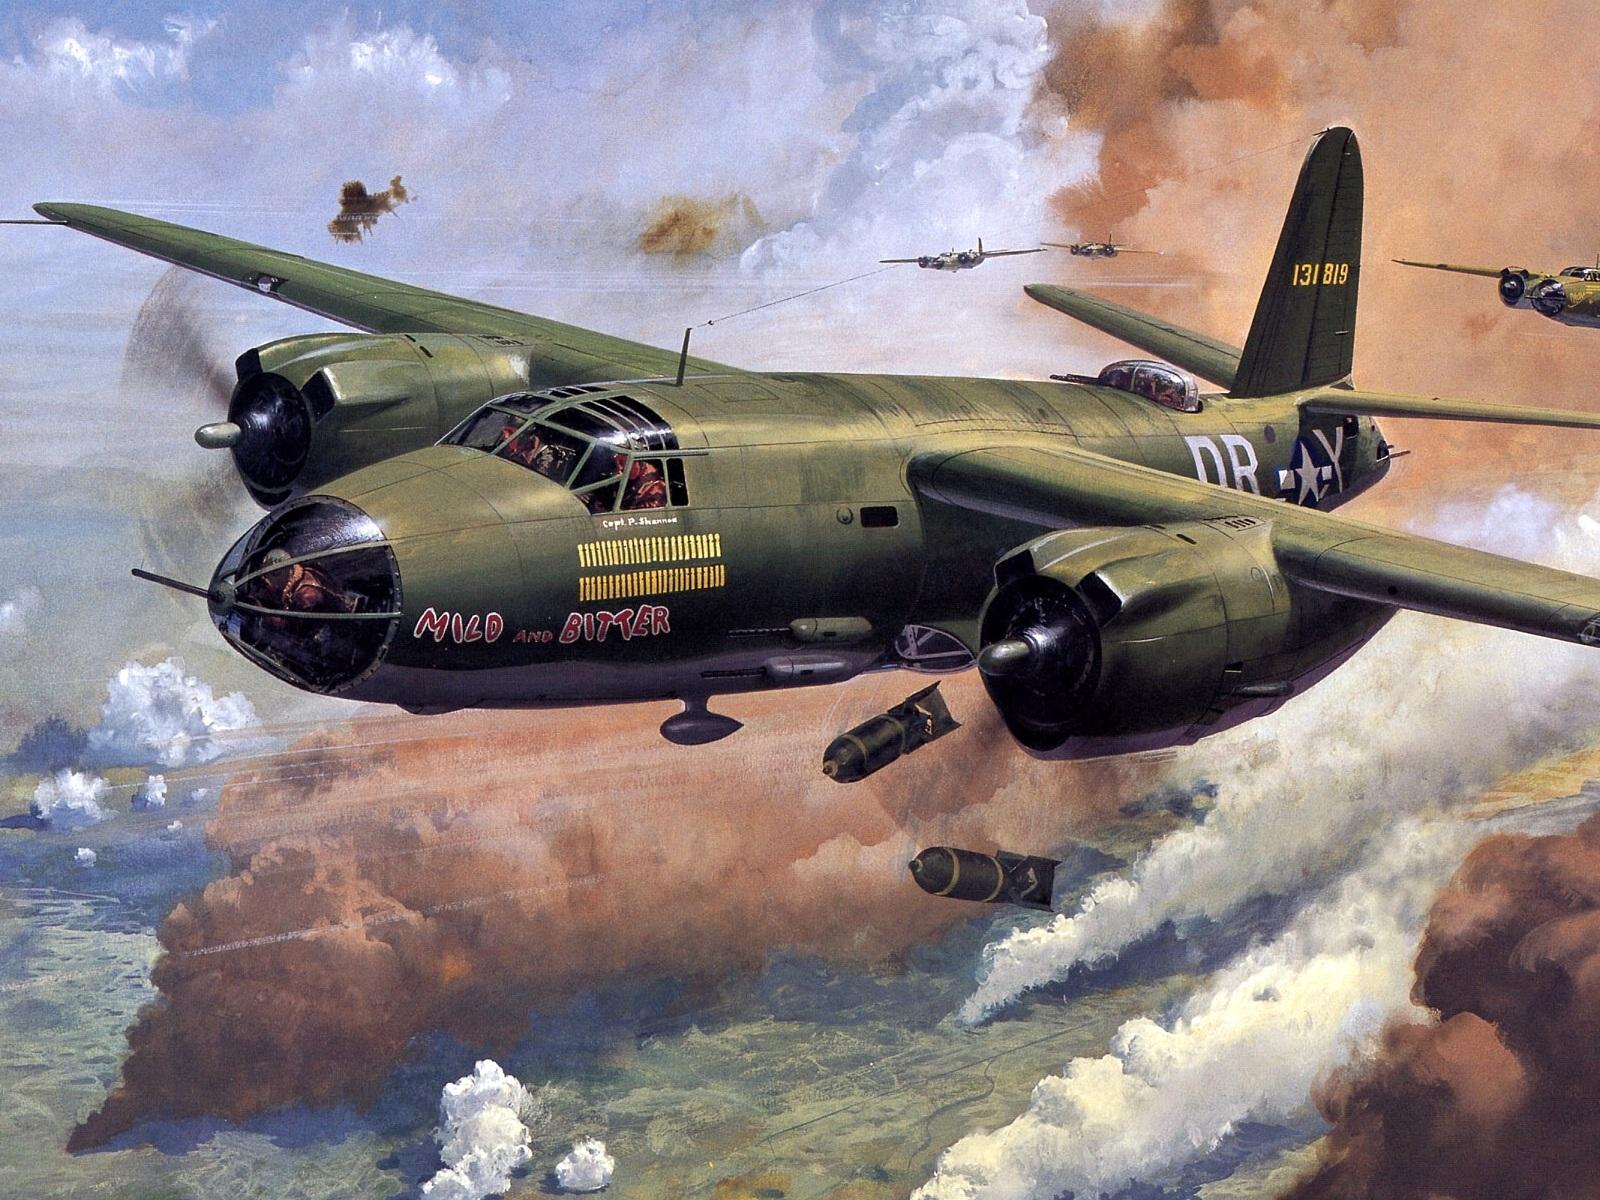 Aircrafts Bomber Wallpaper 1600x1200 Aircrafts Bomber Aviation B26 1600x1200